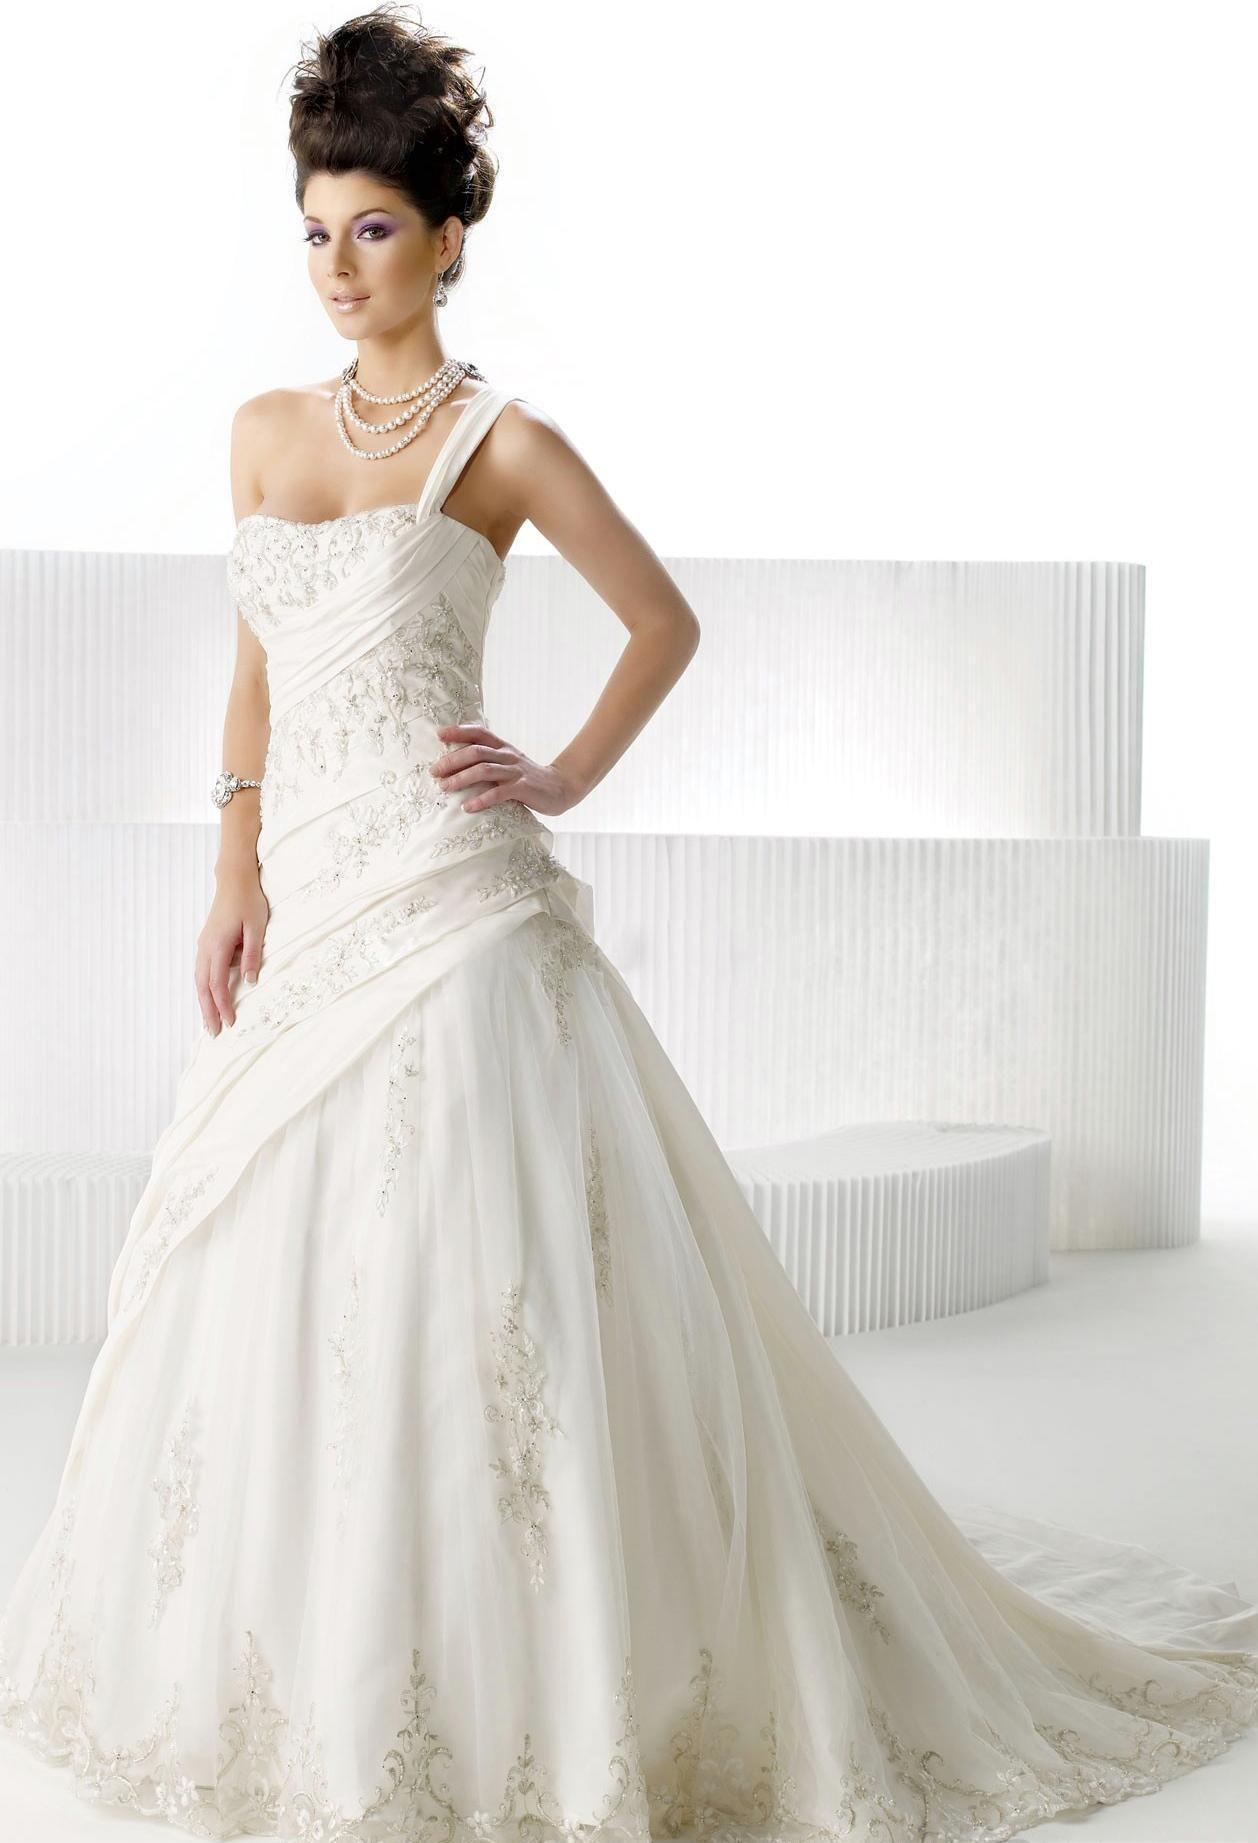 One strap wedding dress  wedding dresses princess wedding dresses with straps wedding dresses